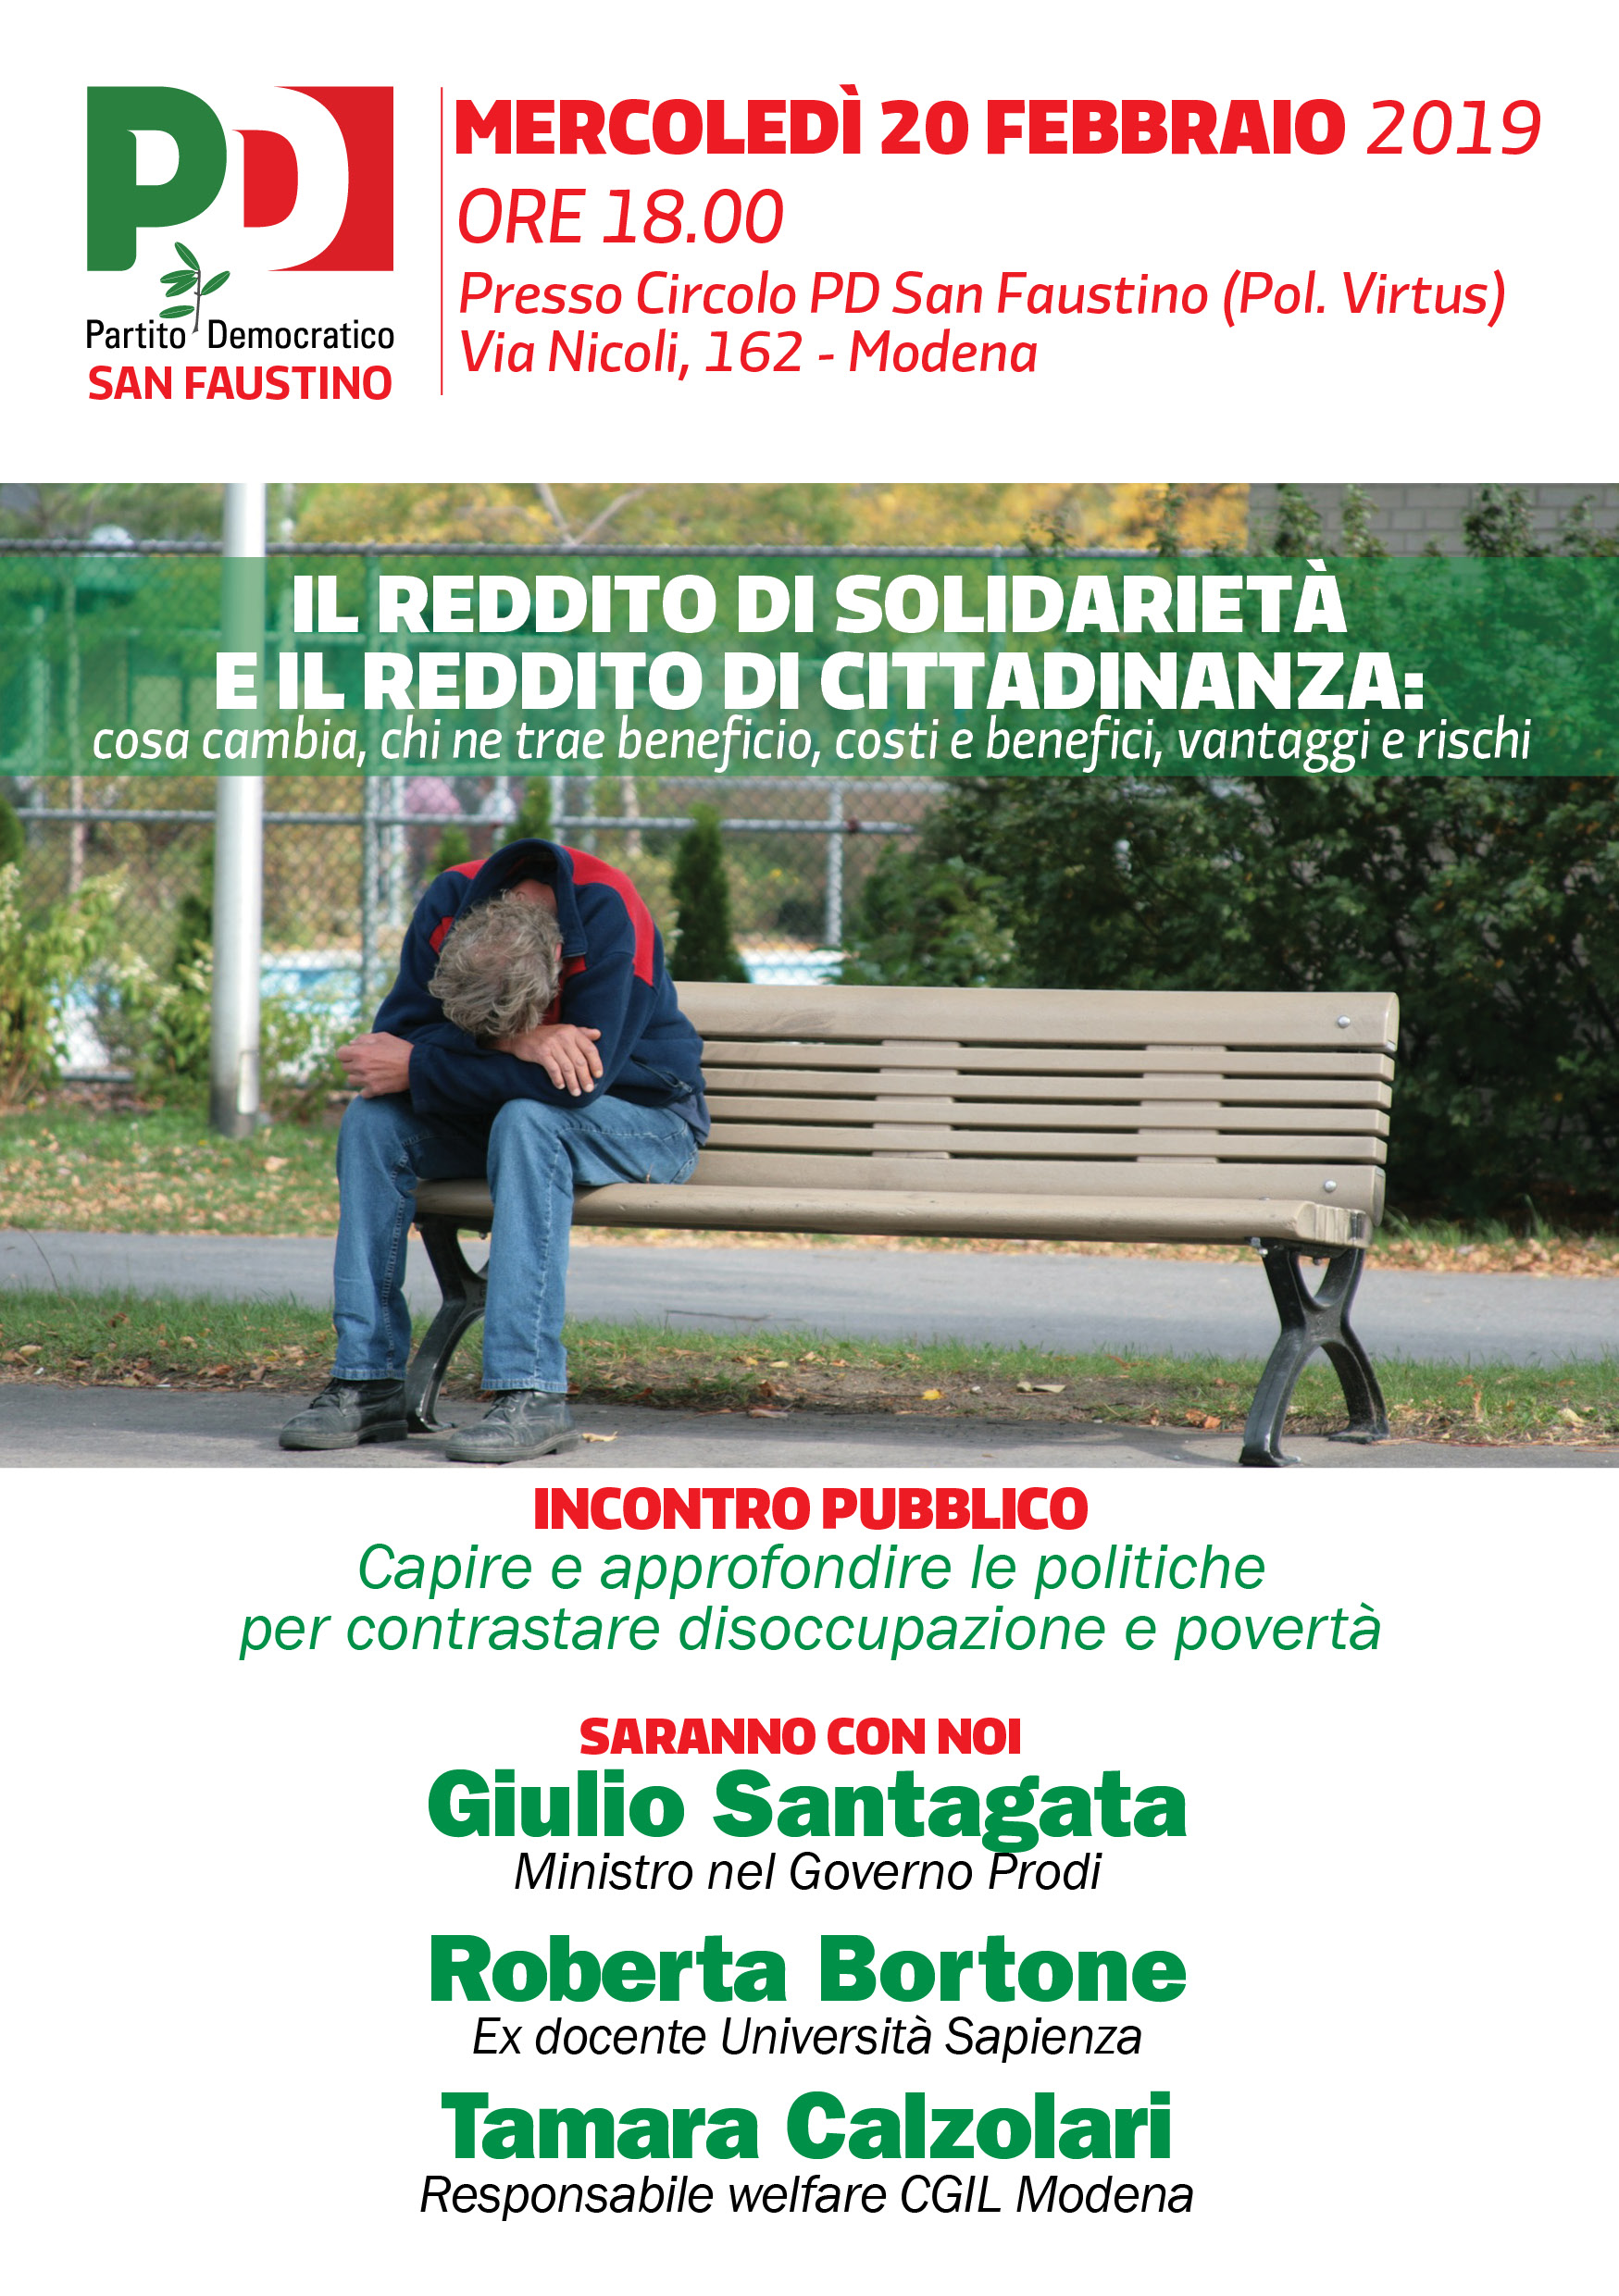 San Faustino, 20 febbraio